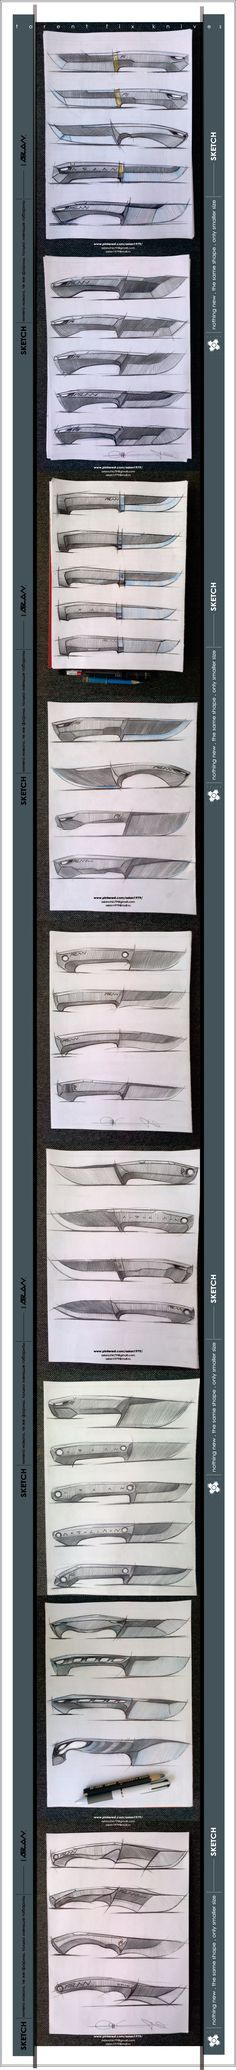 torent knives : )